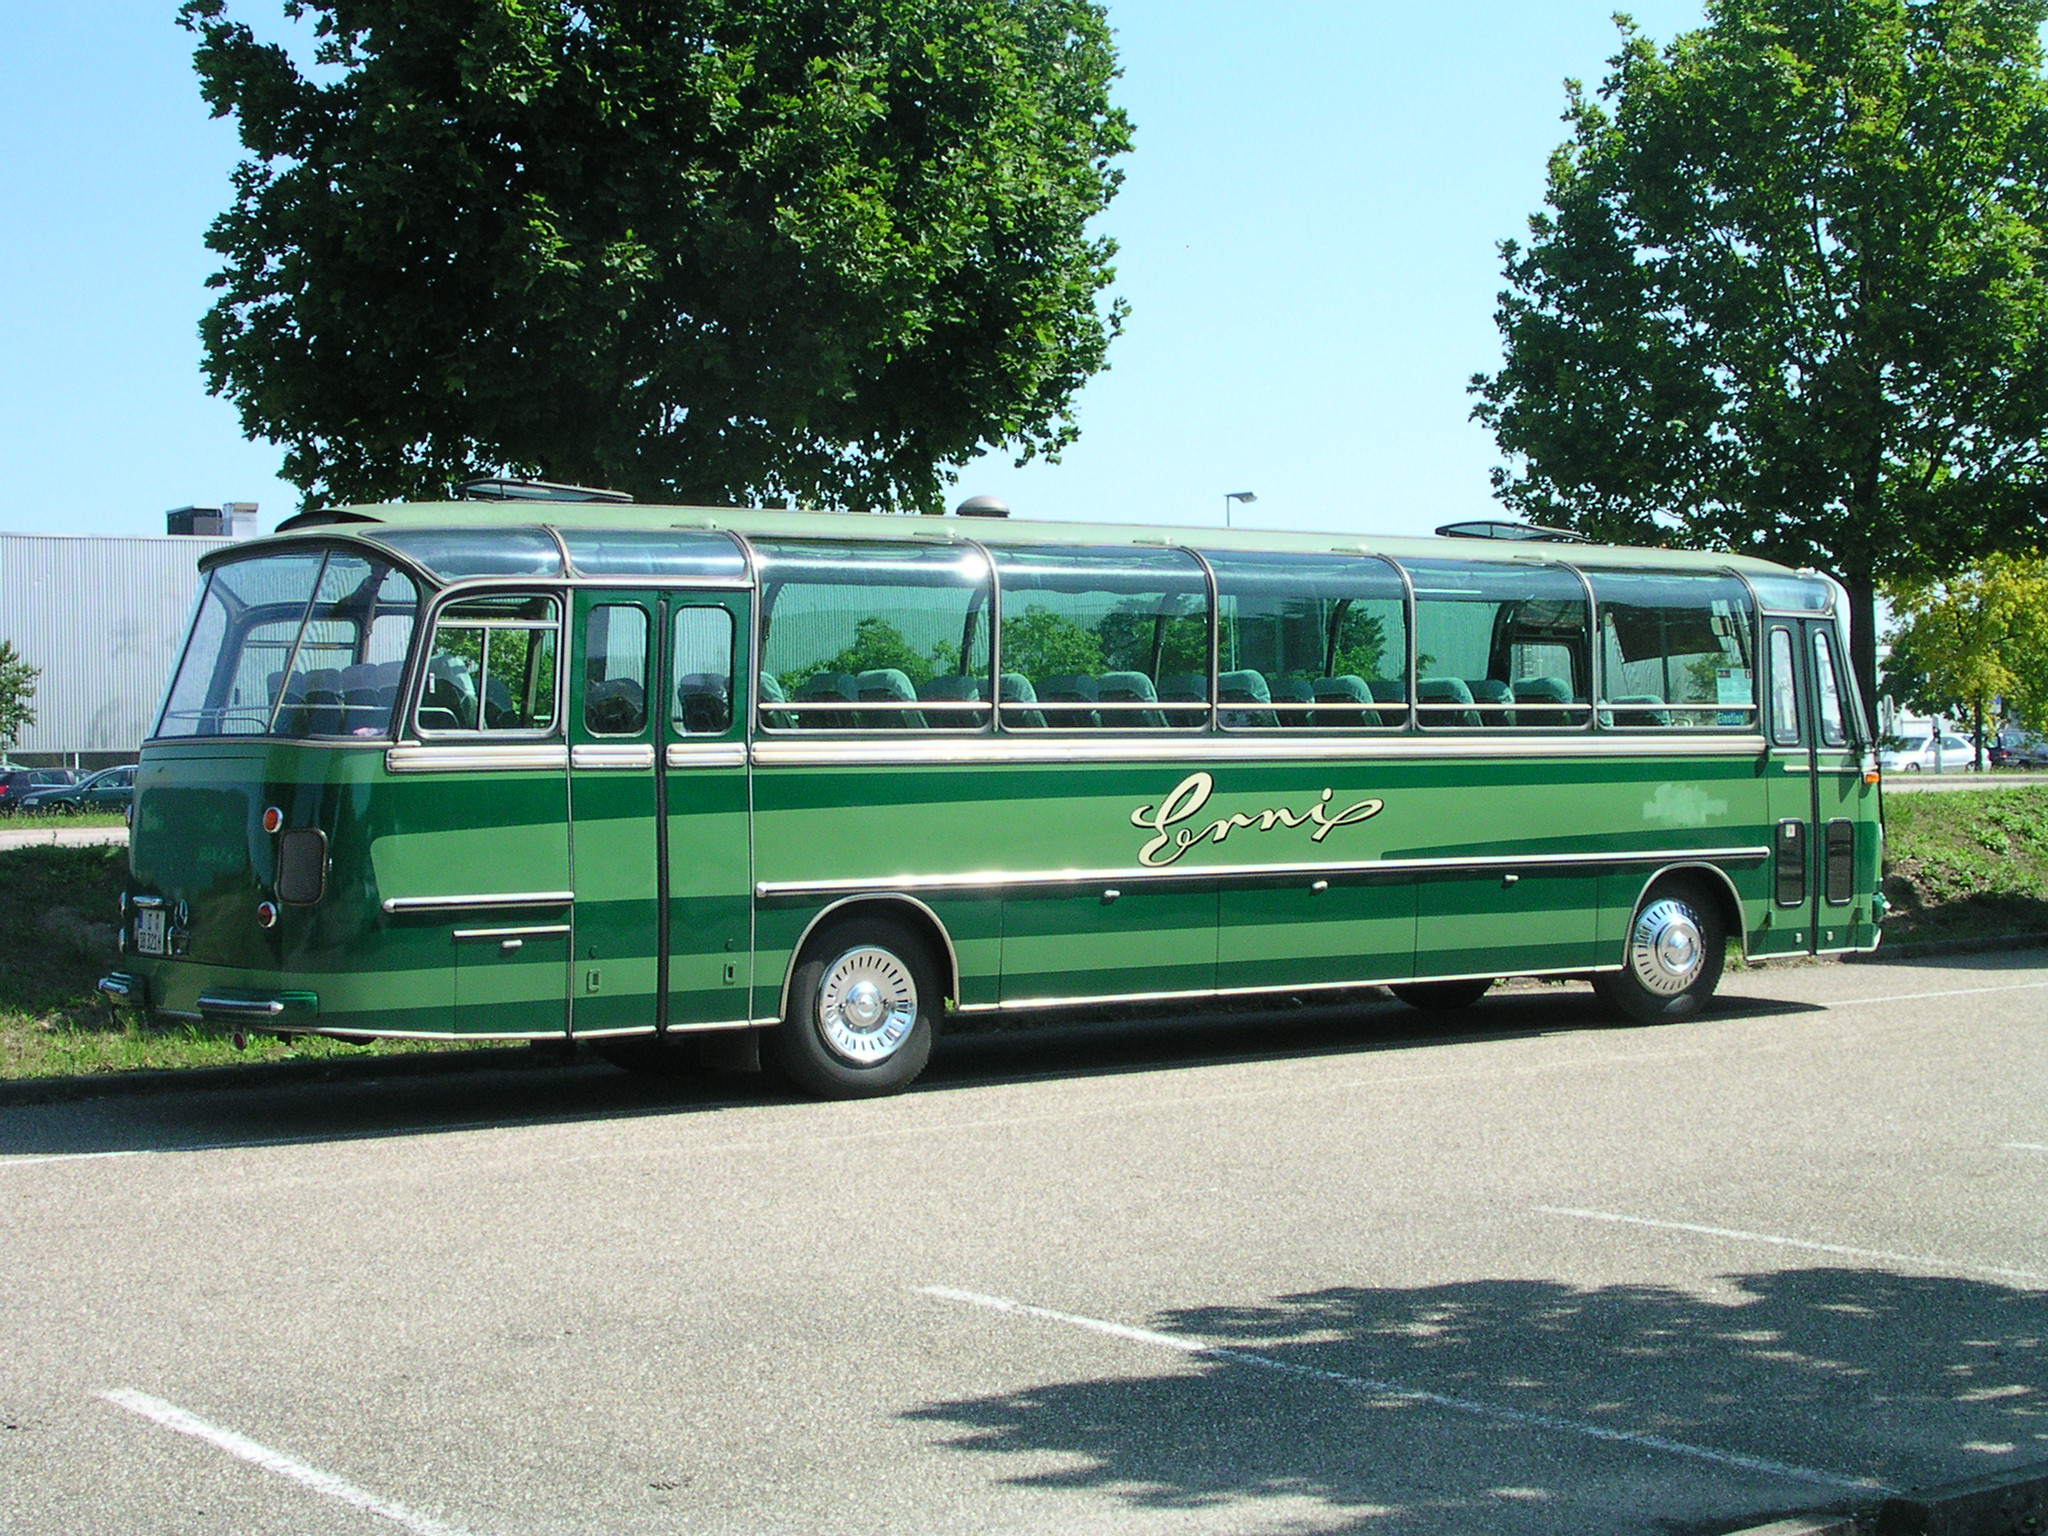 Details about 1984 drogmoller mercedes benz tour bus for Mercedes benz tour bus